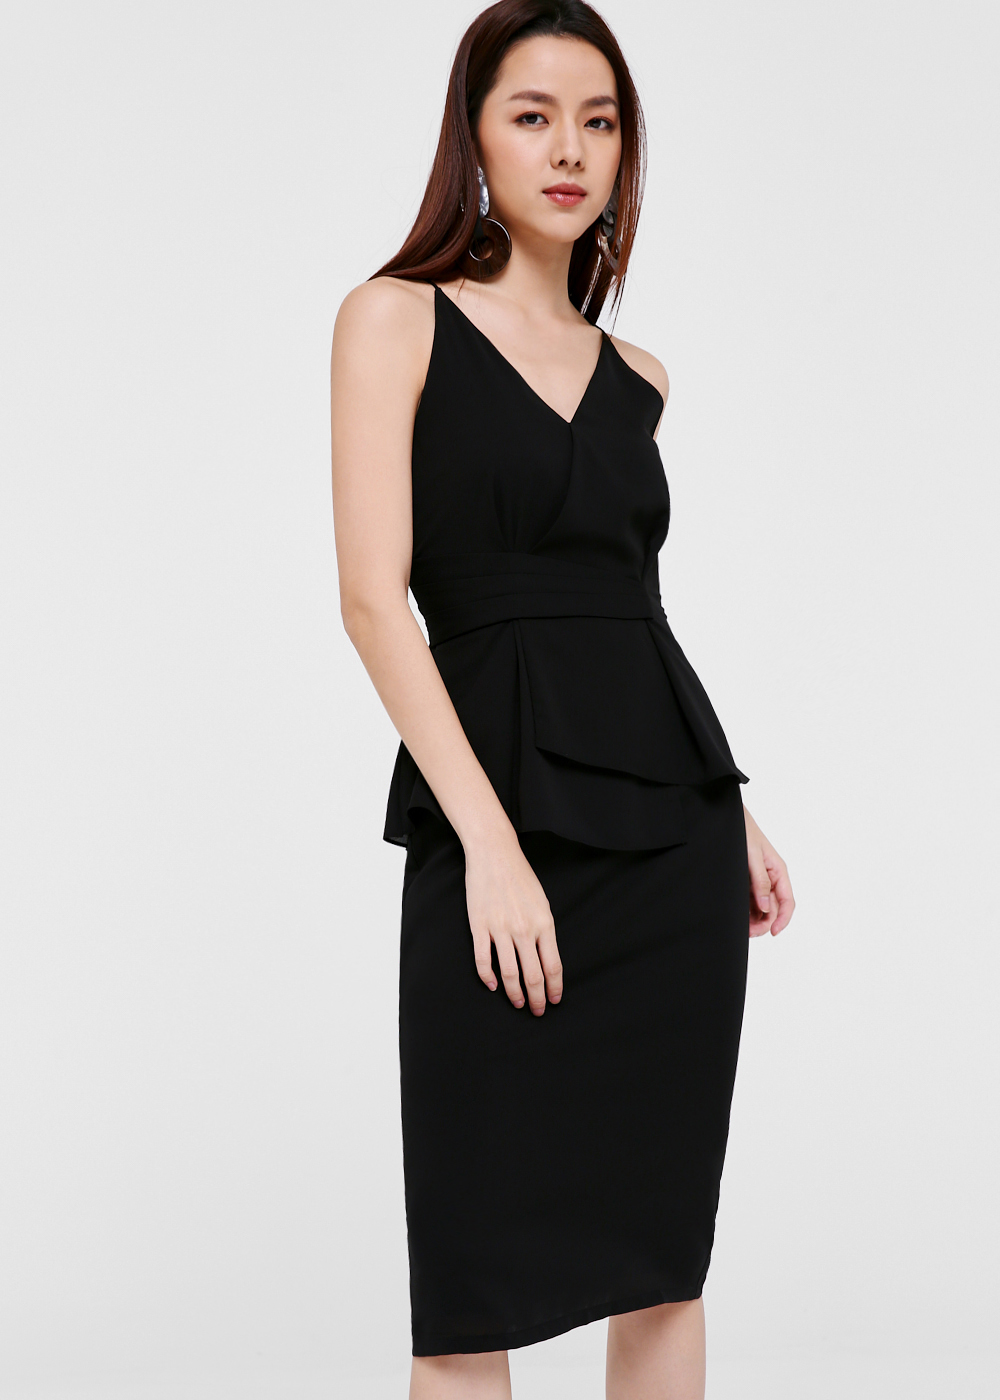 Demi Foldover Peplum Dress